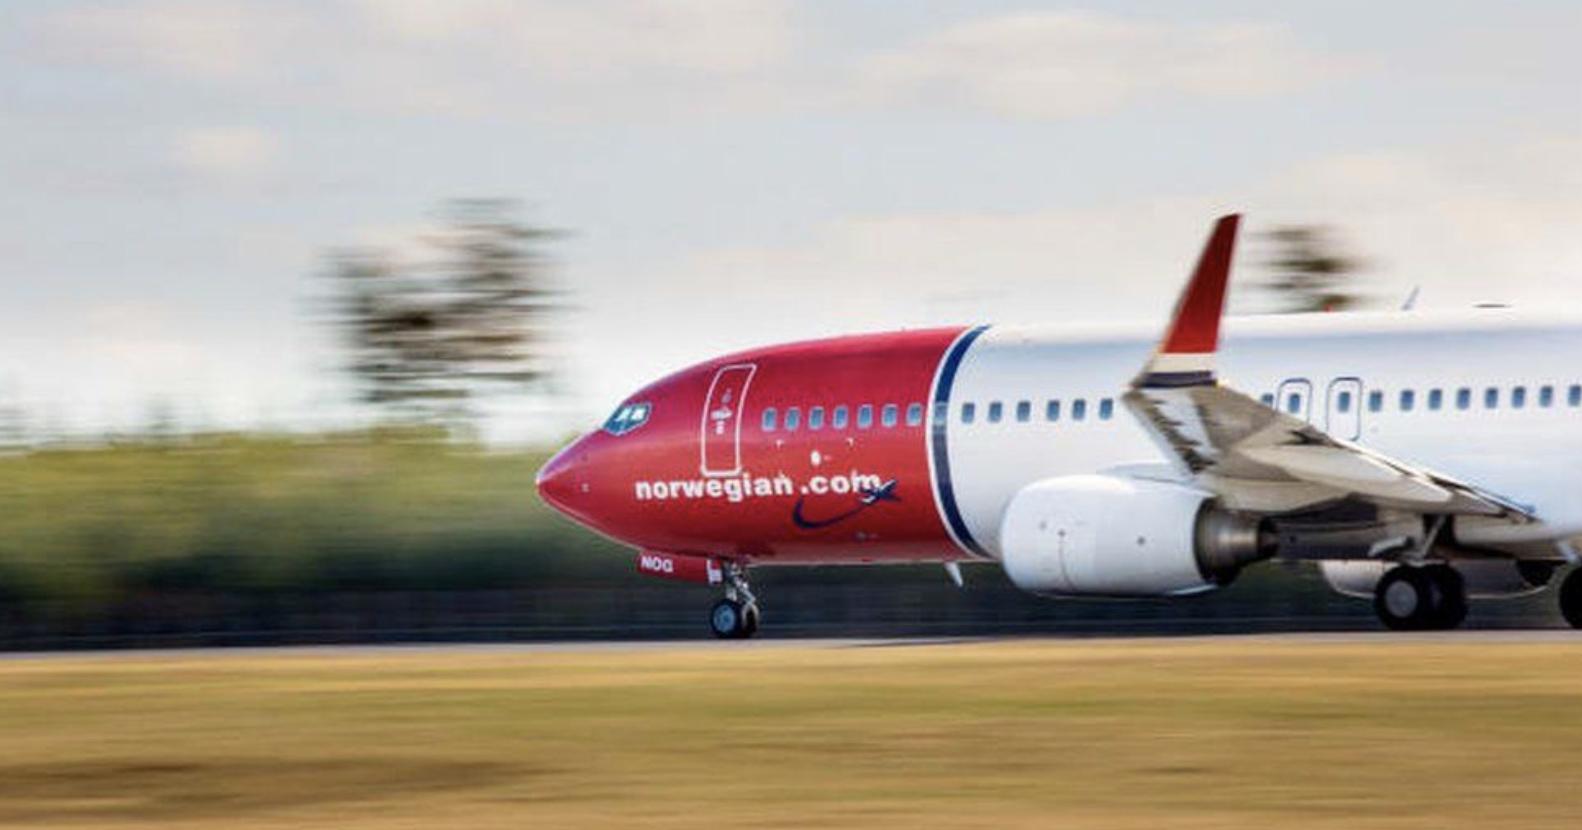 Gatwick: Norwegian Axes 1,000 Jobs at Airport in Long Haul Cuts